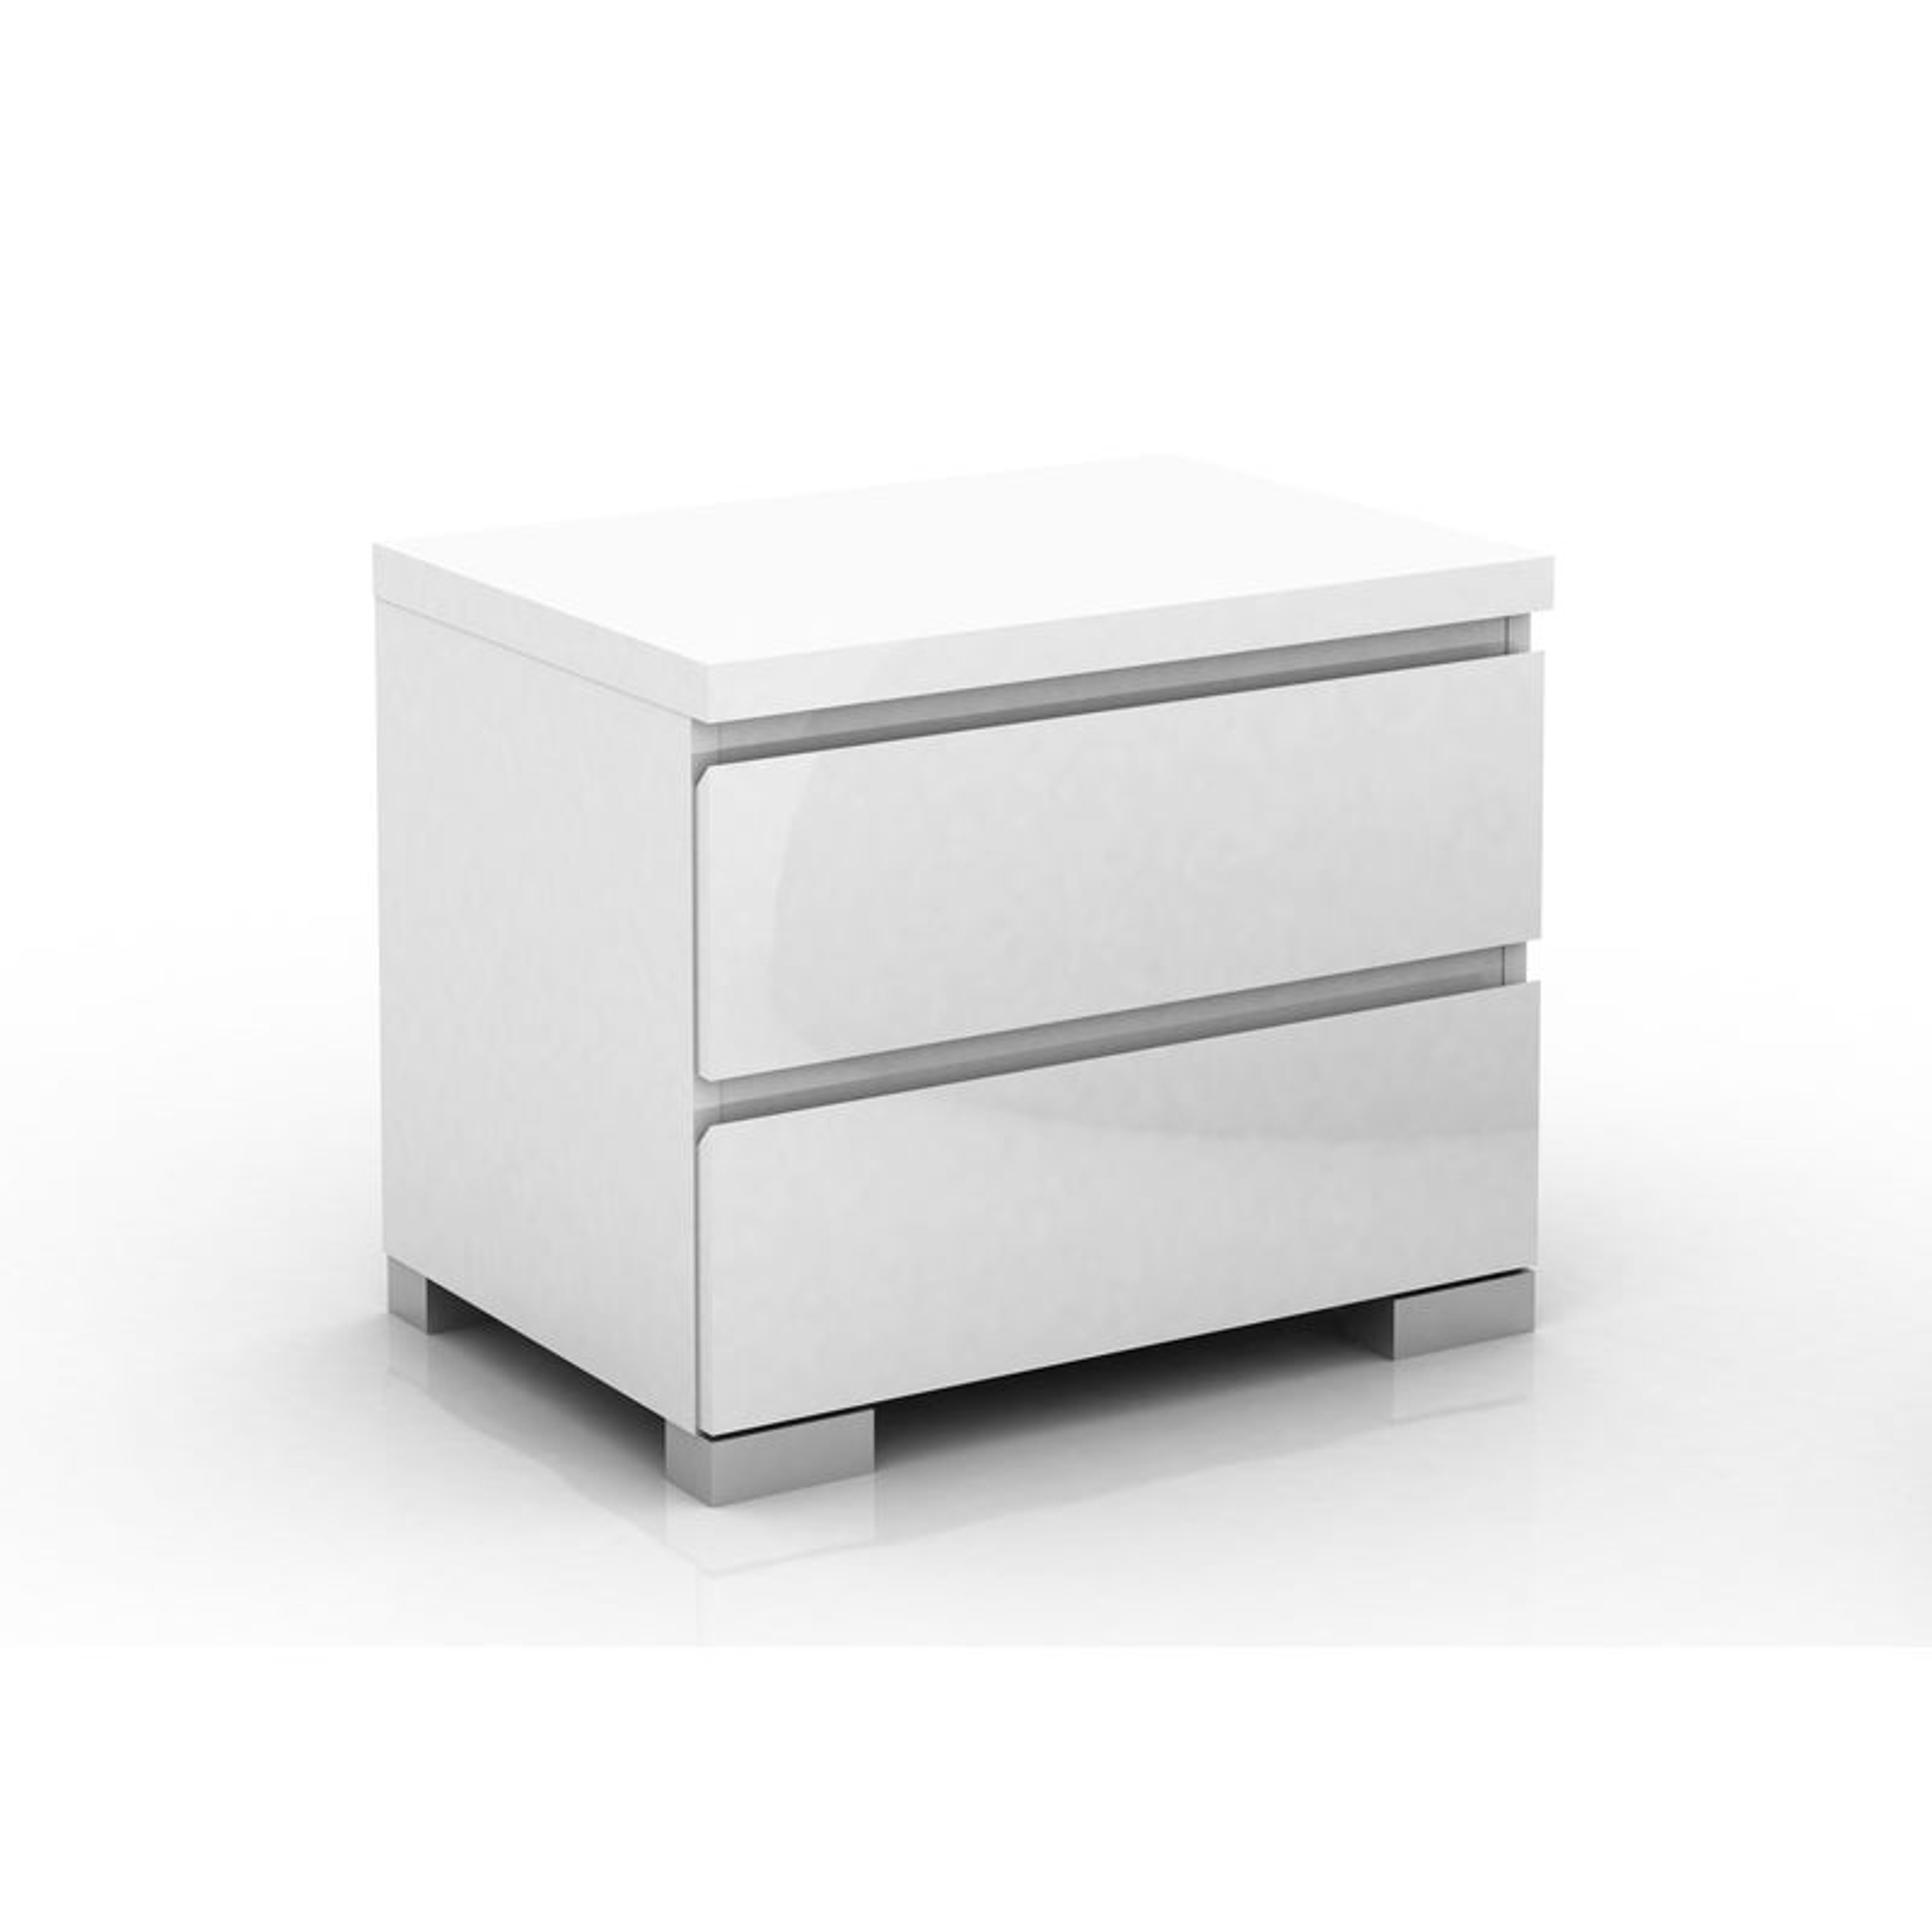 Elara 2 Drawer Bedside Table in High Gloss White